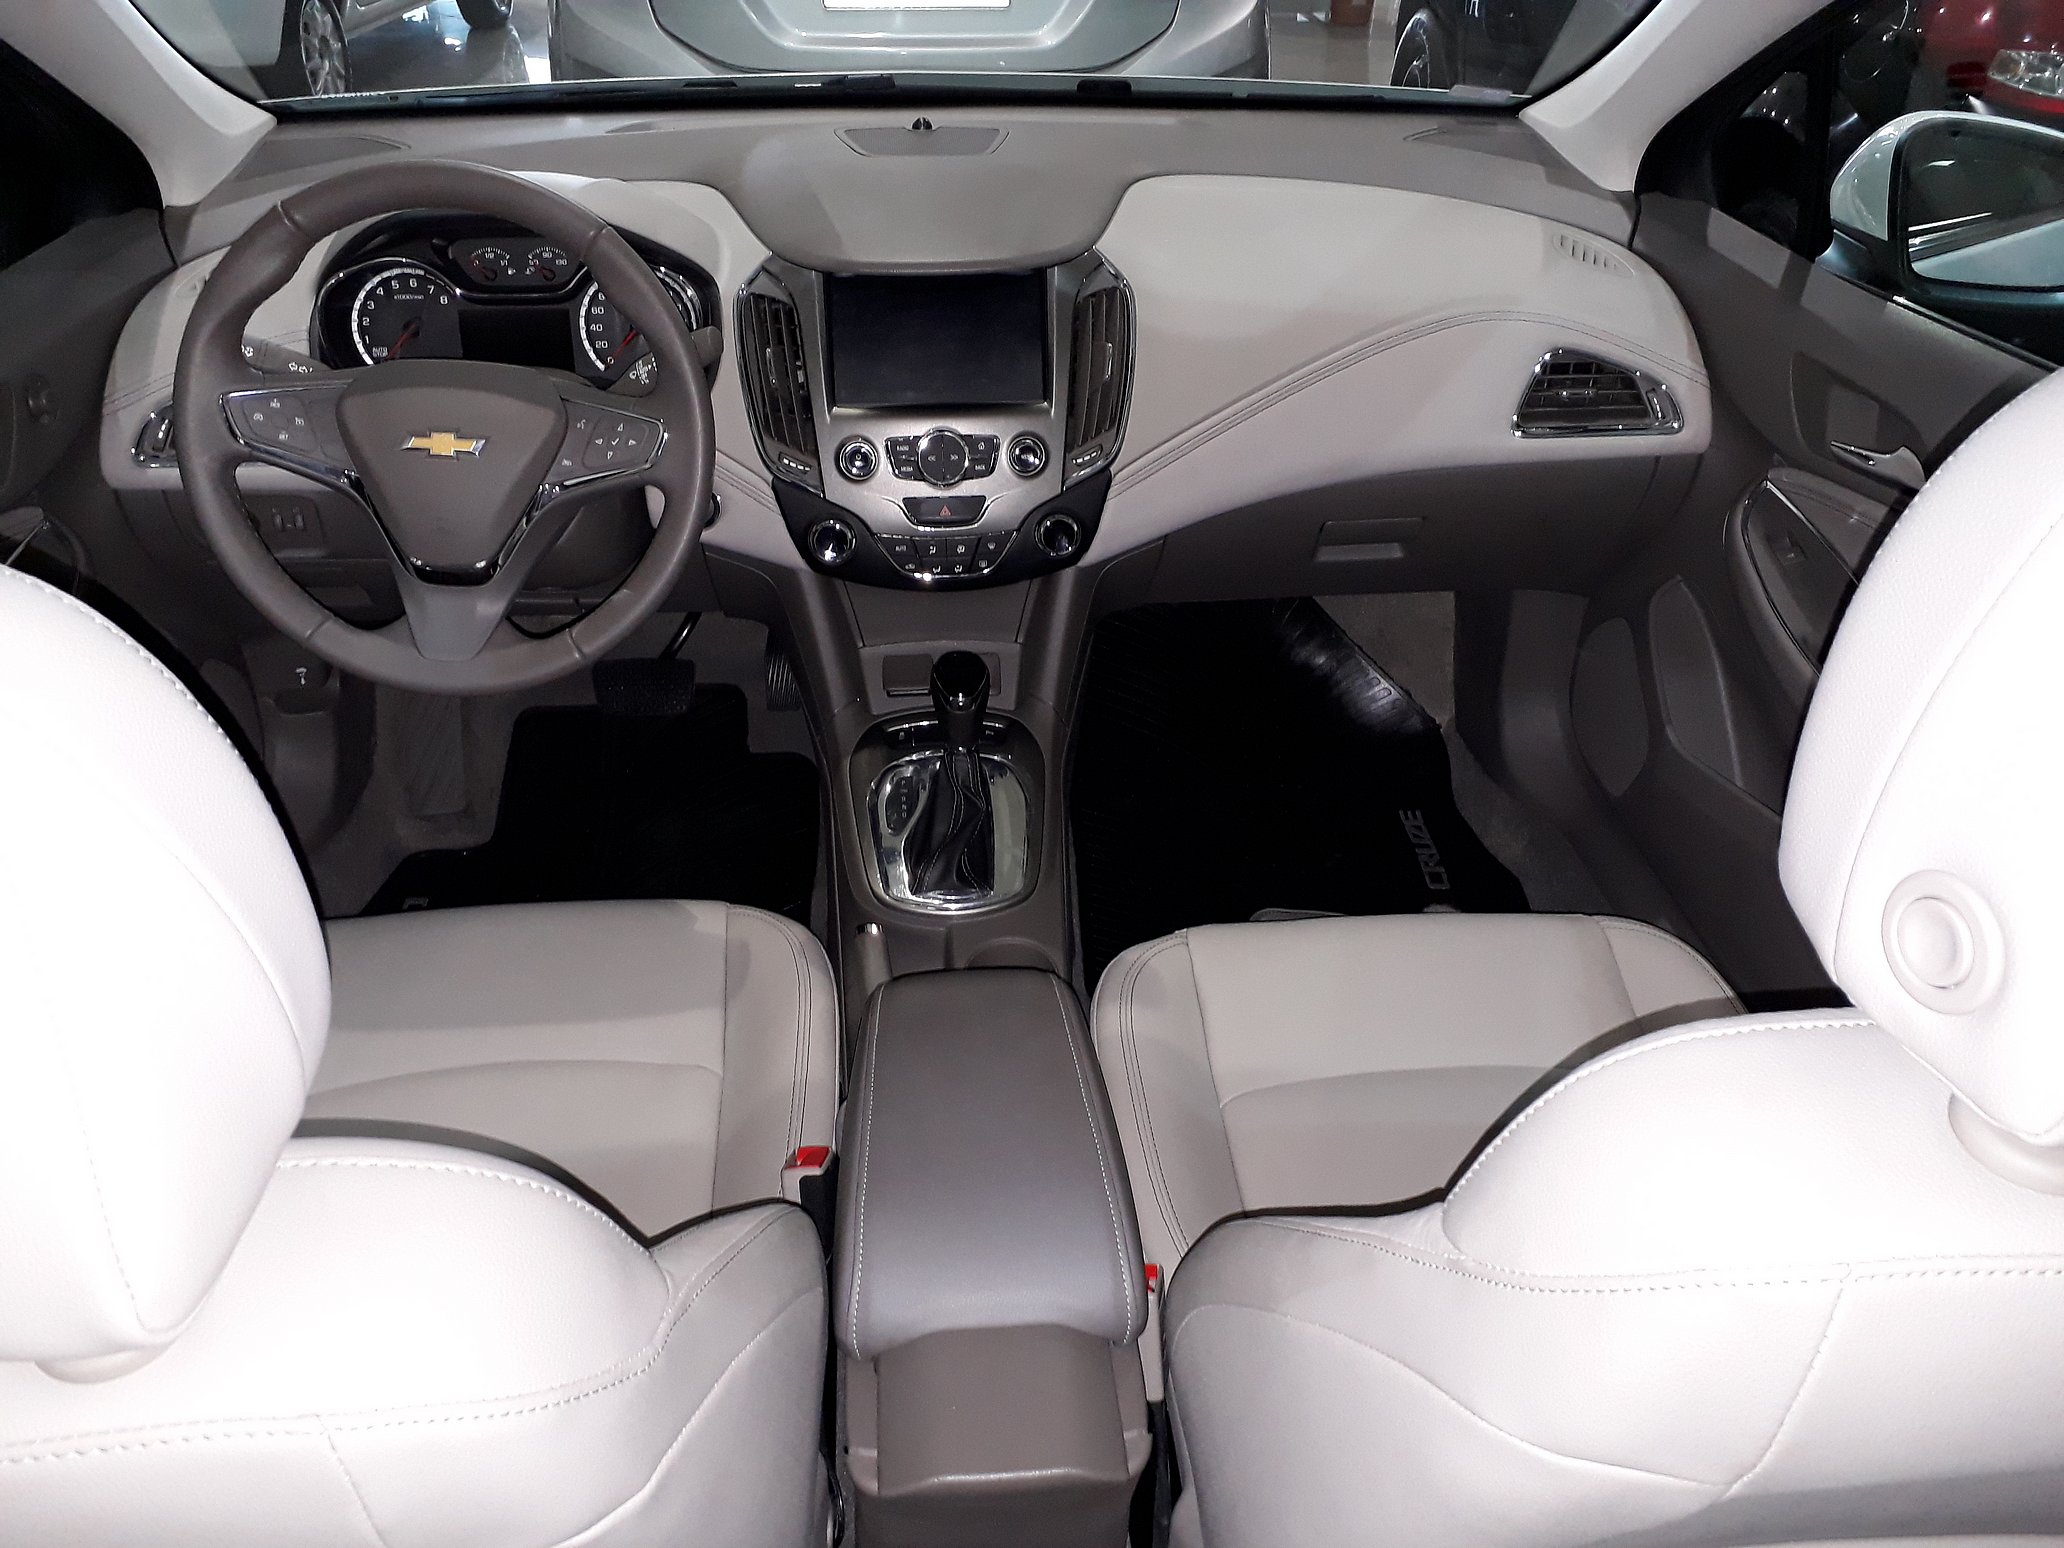 2018 Chevrolet Cruze LTZ 1,4L Turbo